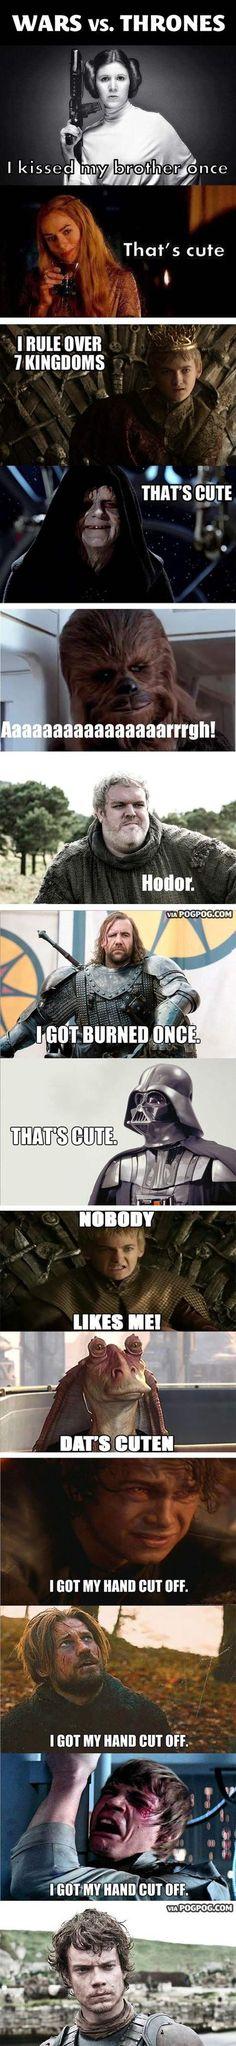 Star Wars vs. Game of Thrones